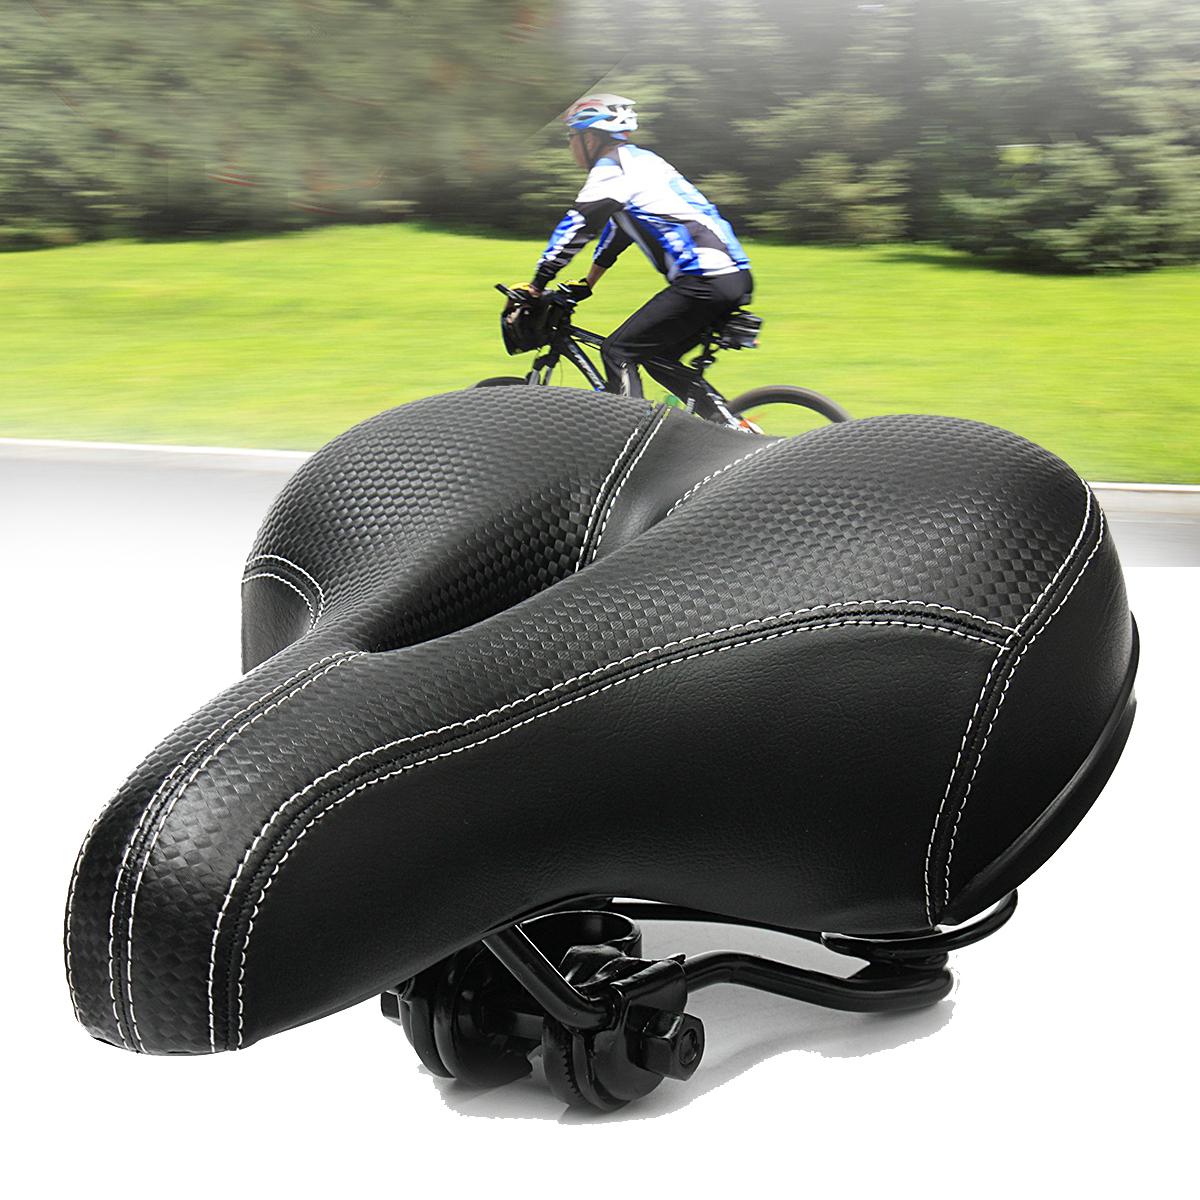 Wide Big Bum Bicycle Saddle Seat Soft Extra Comfort Cushion Pad Gel Cycling Bike